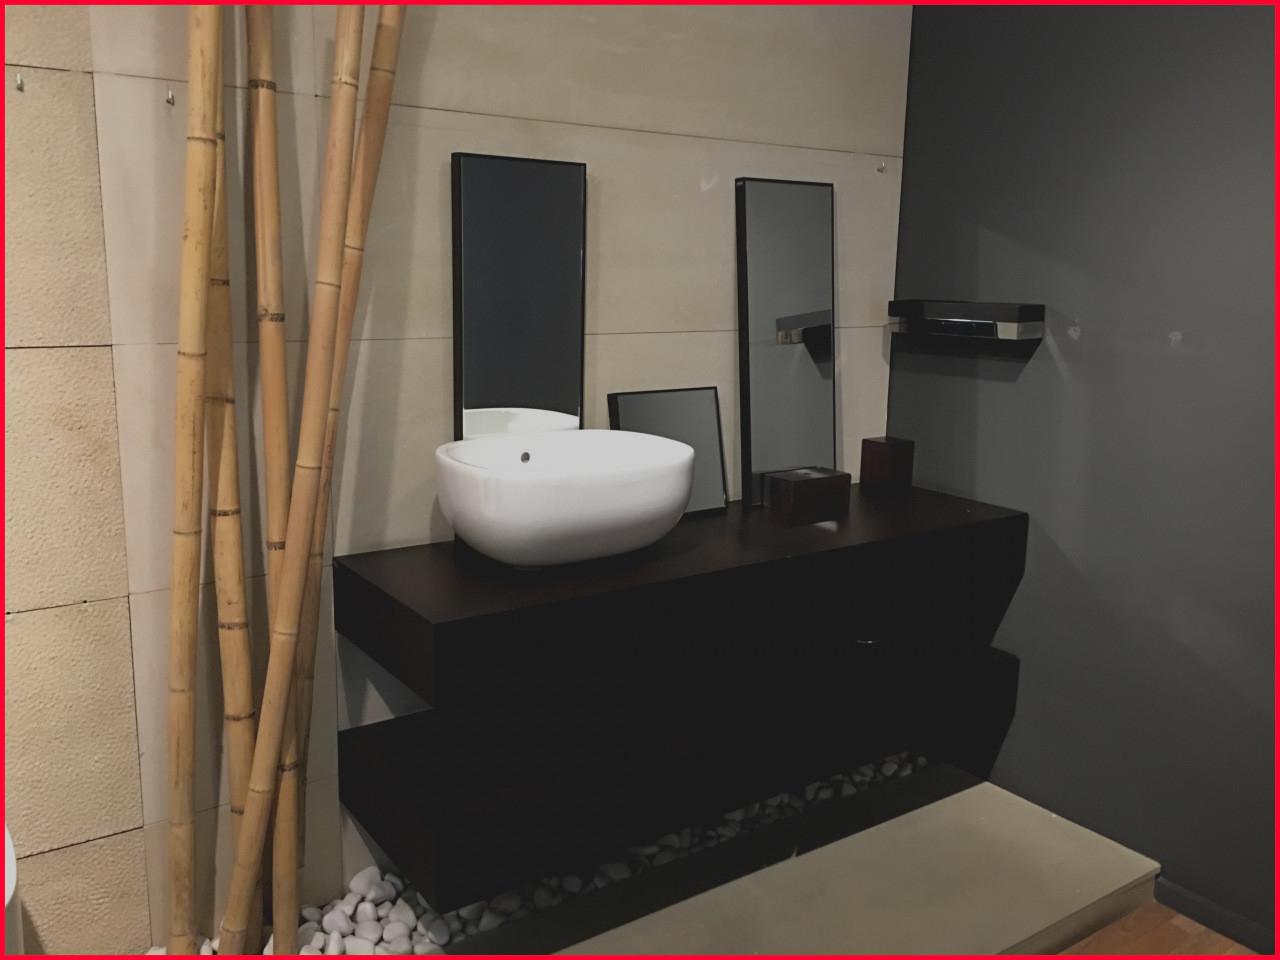 Lavabos sobre Mueble Nkde Mueble Lavabo sobre Encimera Mueble Lavabo sobre Encimera 31